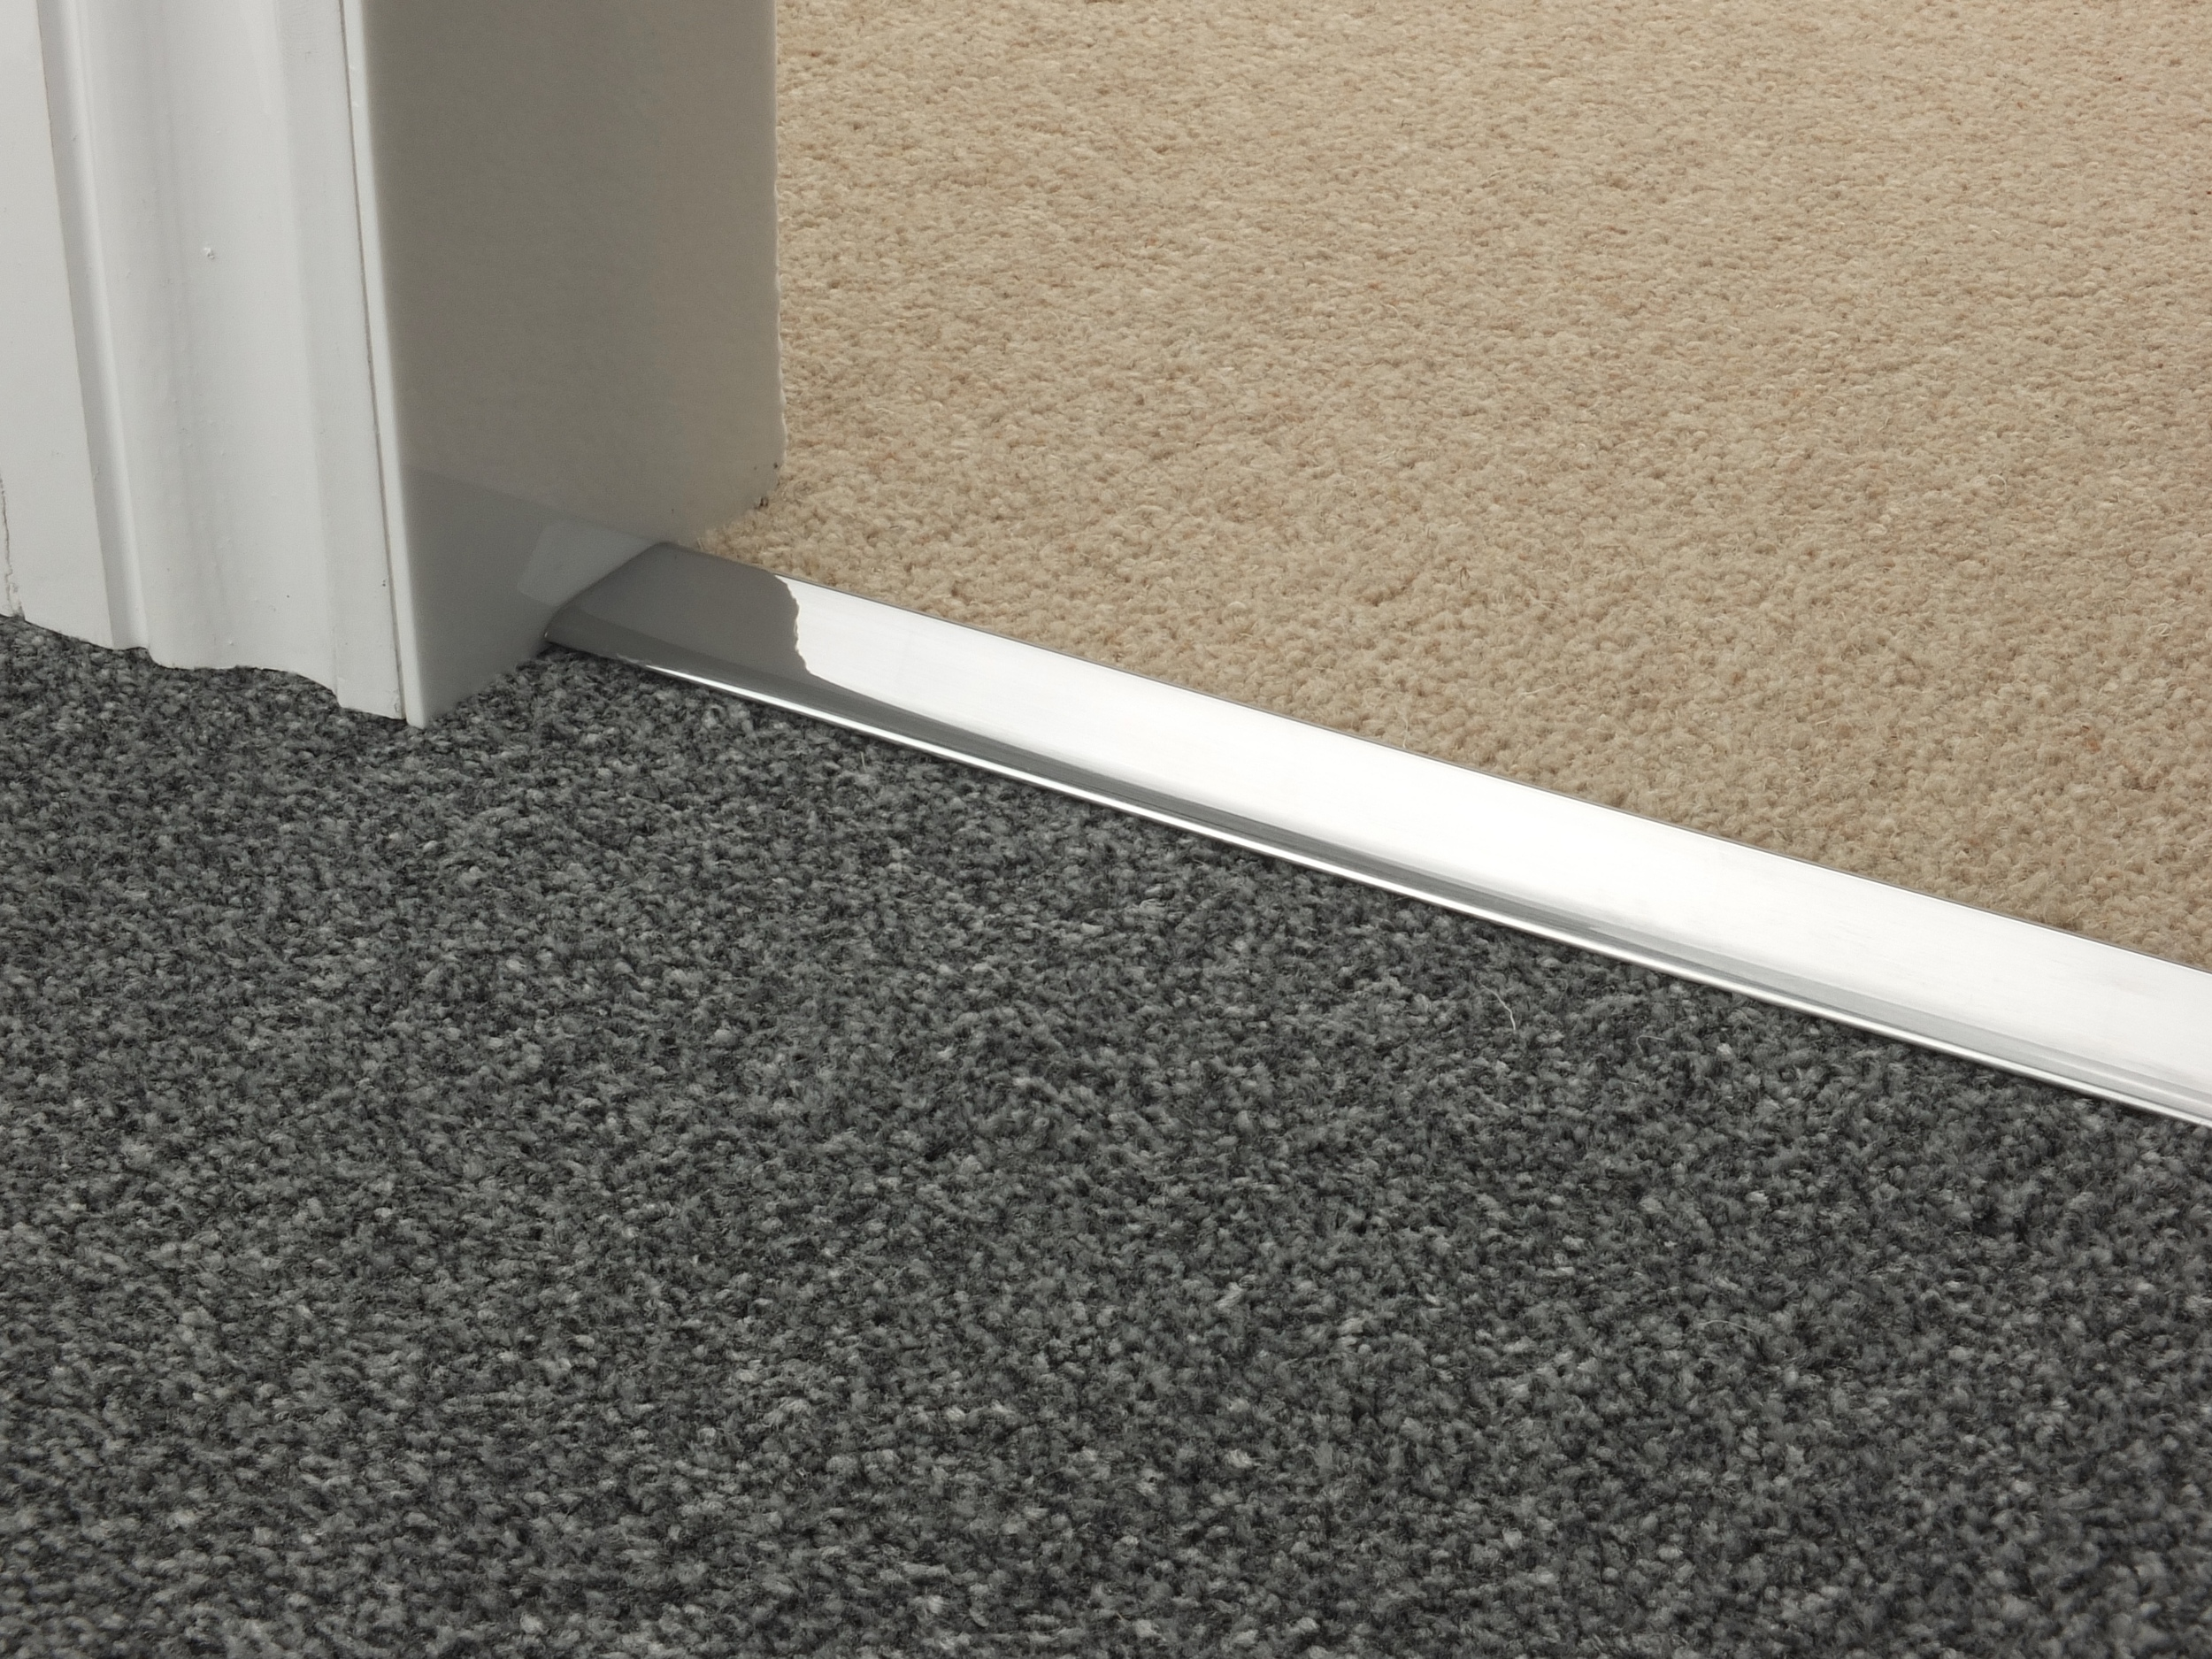 door_bar_brushed_chrome_doublez_carpet_carpet.jpg